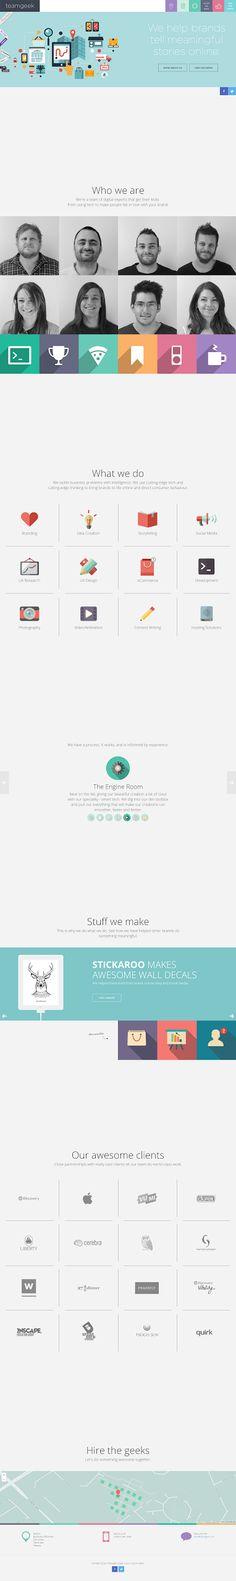 teamgeek.png - Google Drive